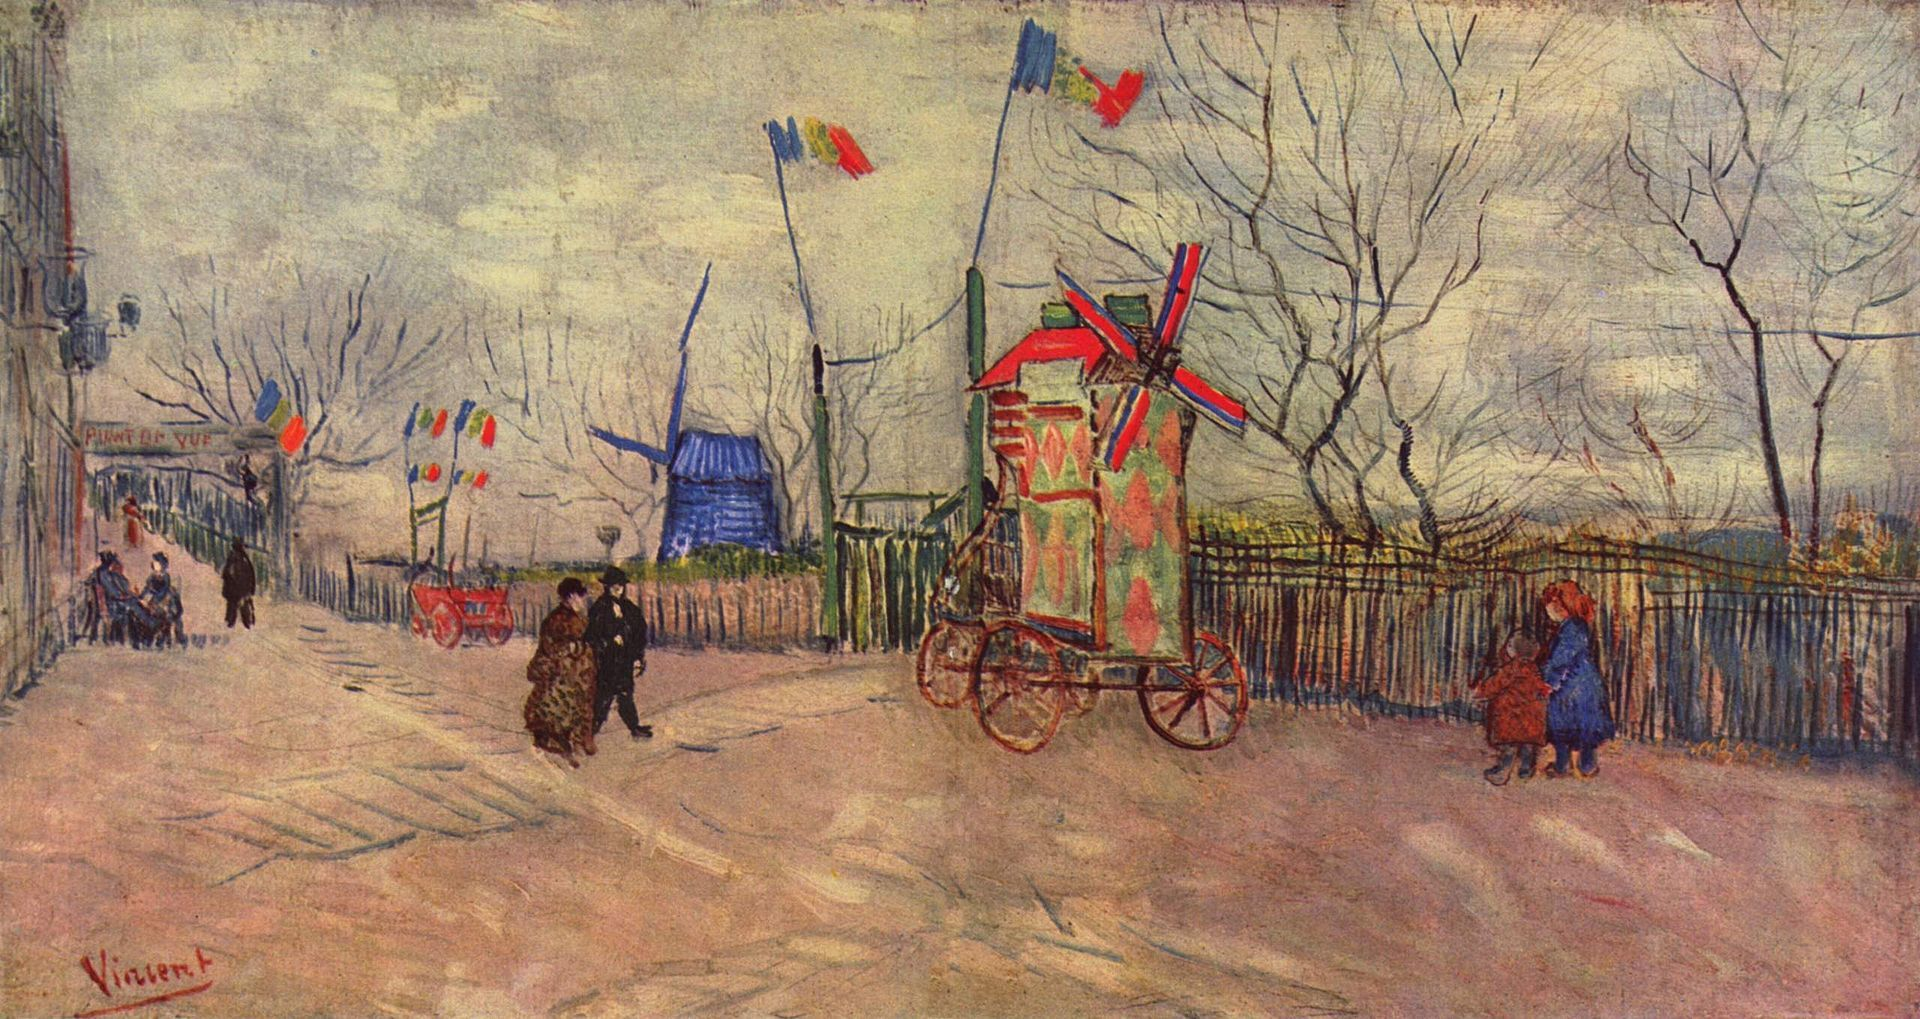 Vincent_Willem_van_Gogh_133